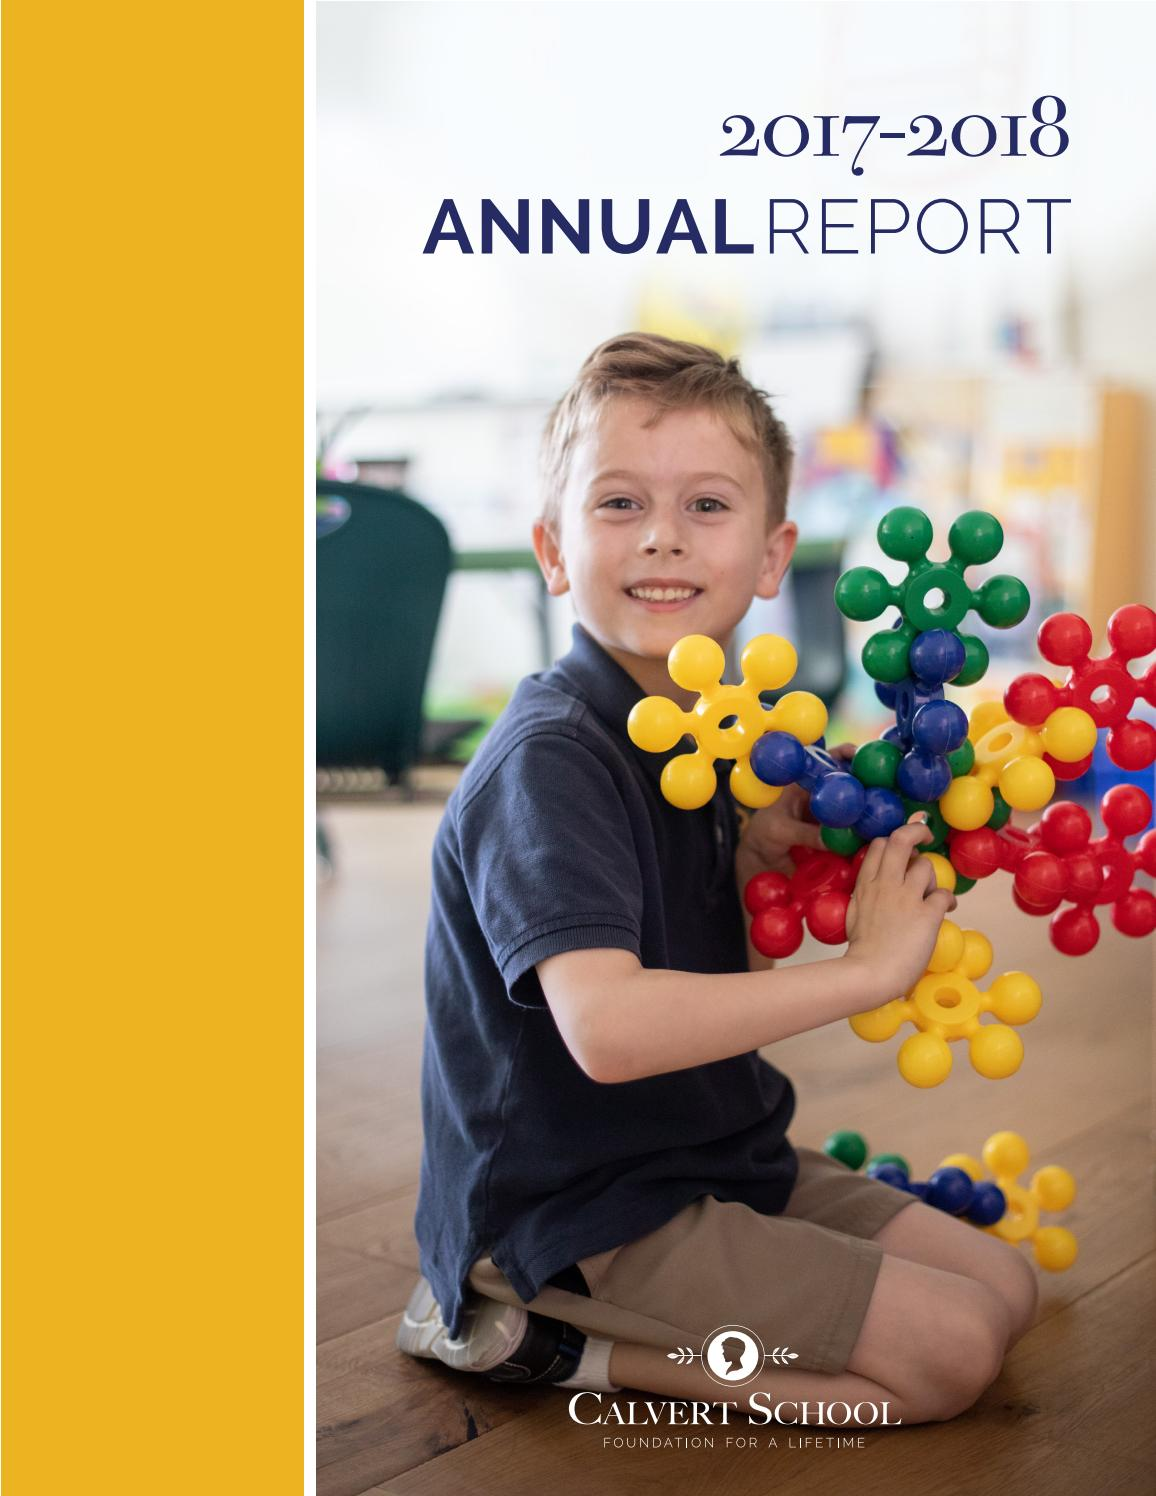 Calvert School - 2017-2018 Annual Report by Calvert School